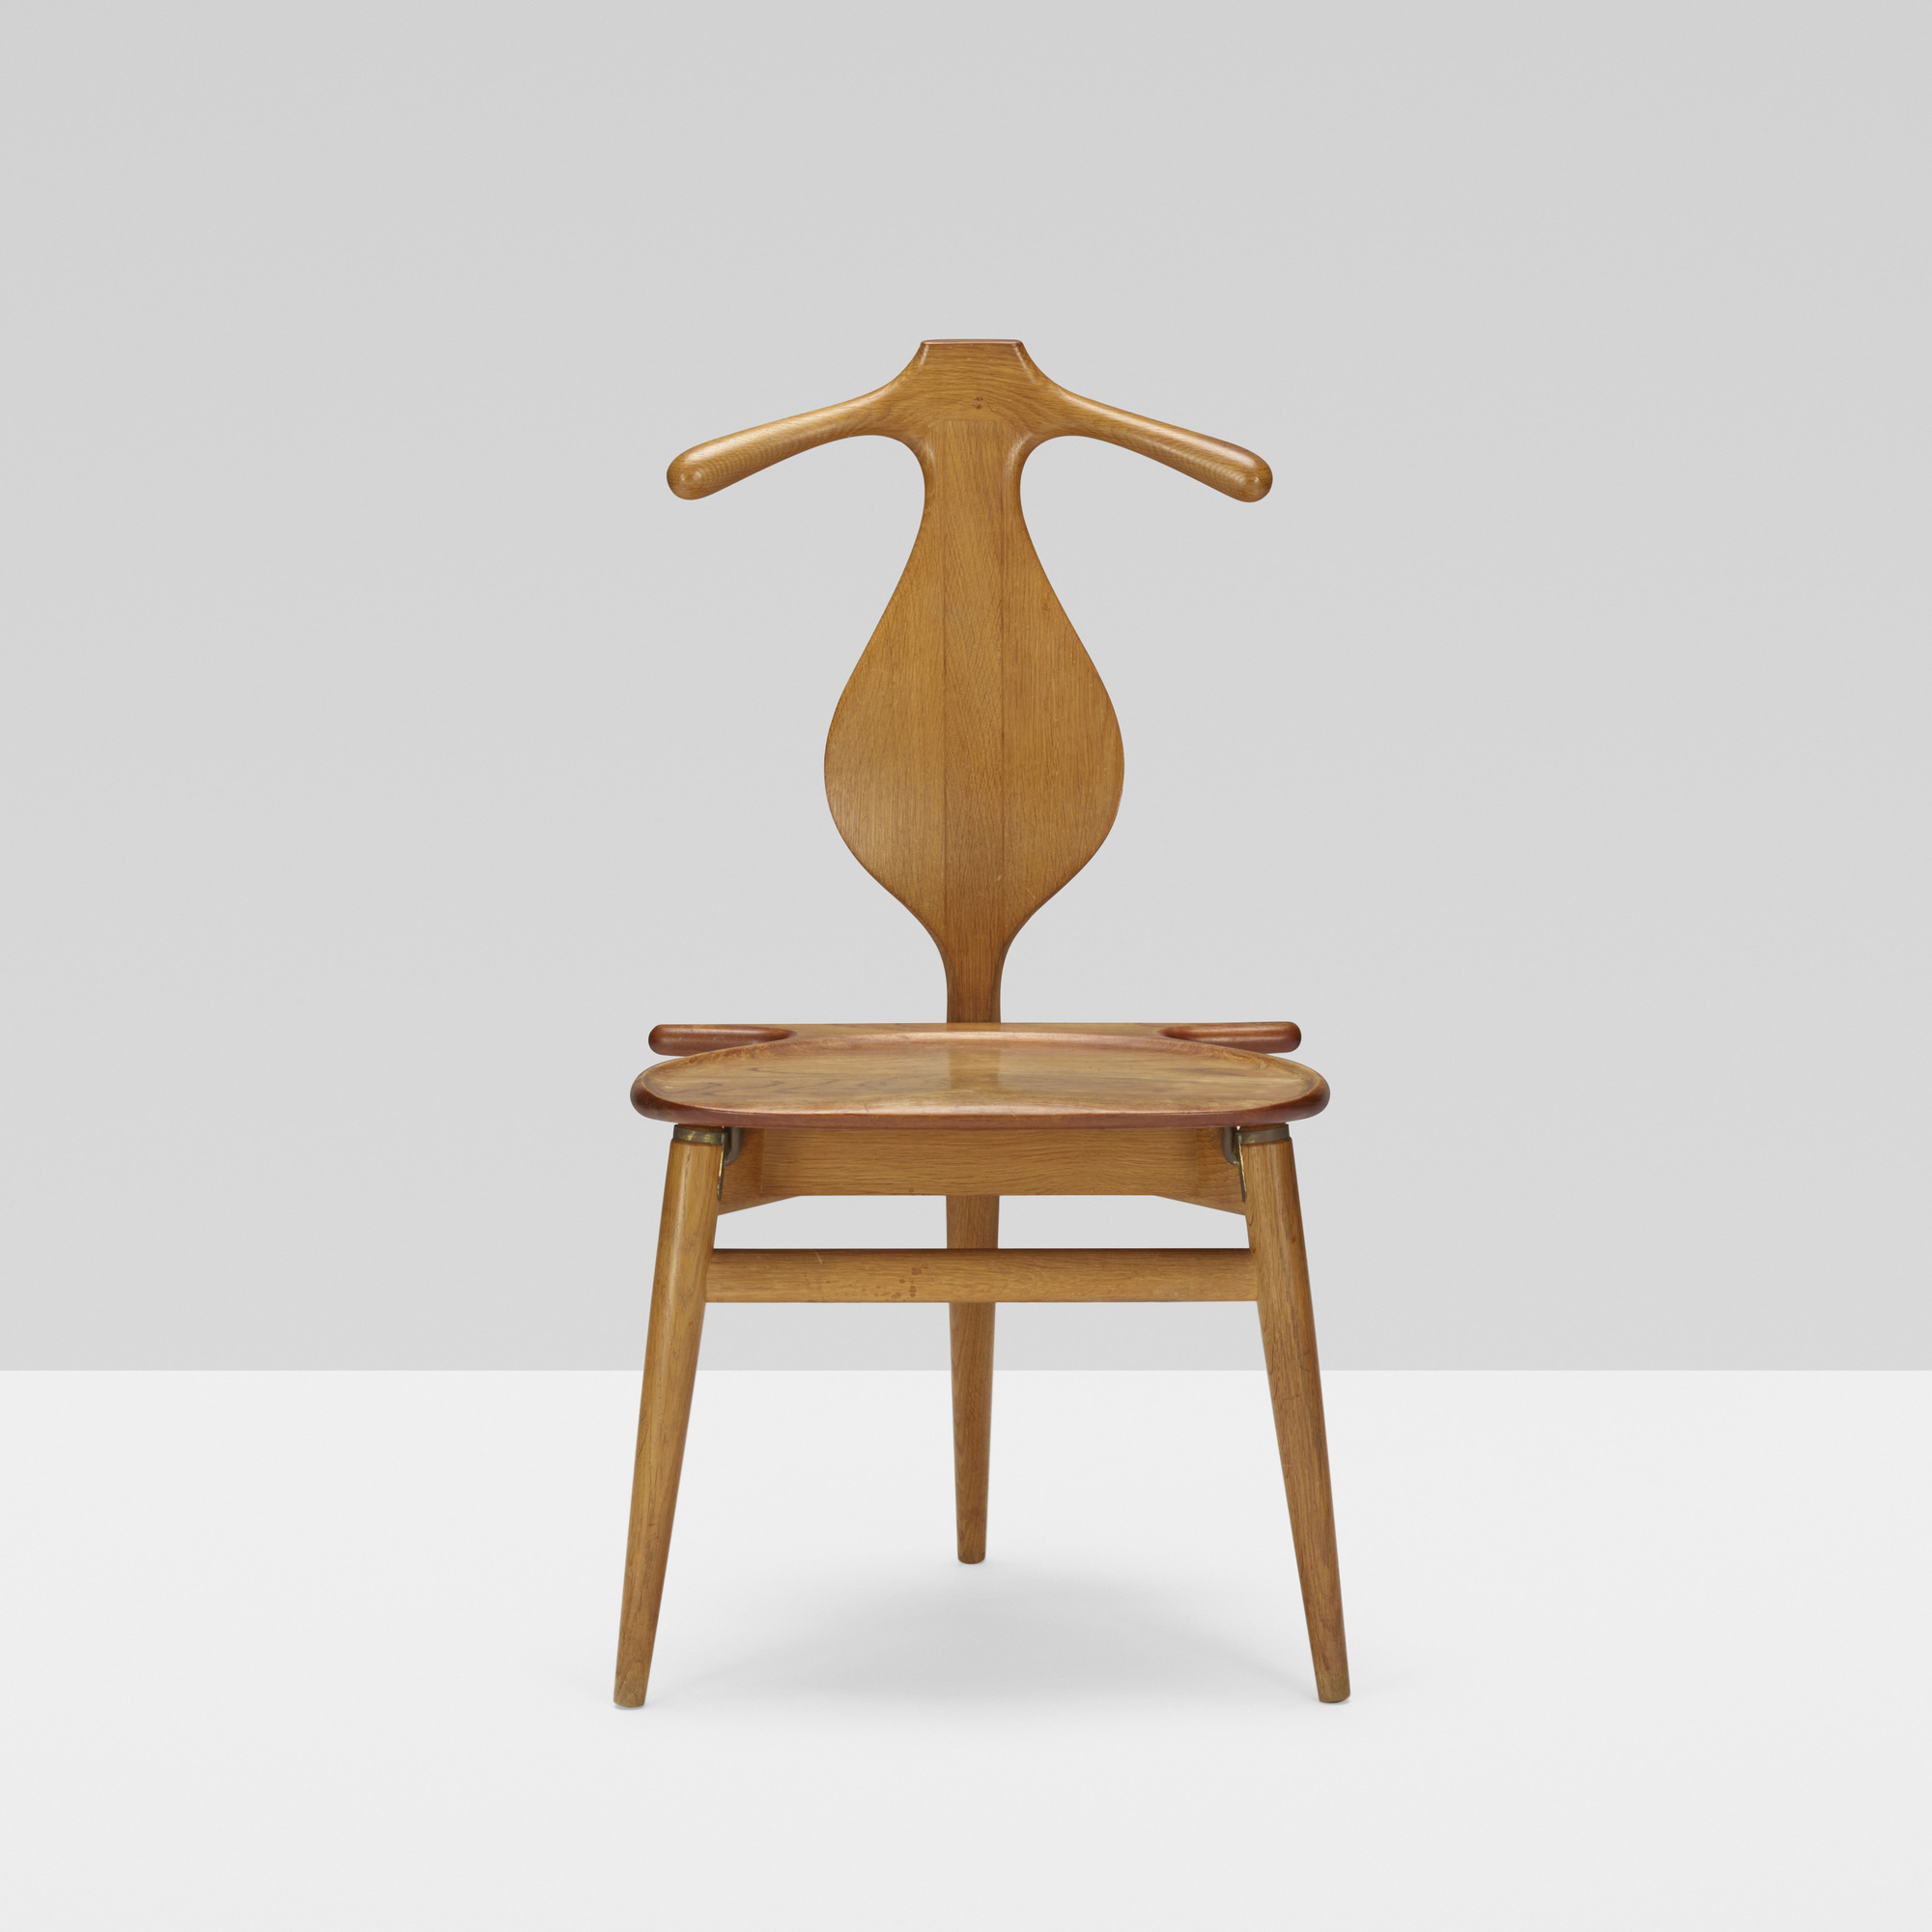 376: Hans J. Wegner / Valet chair (2 of 4)